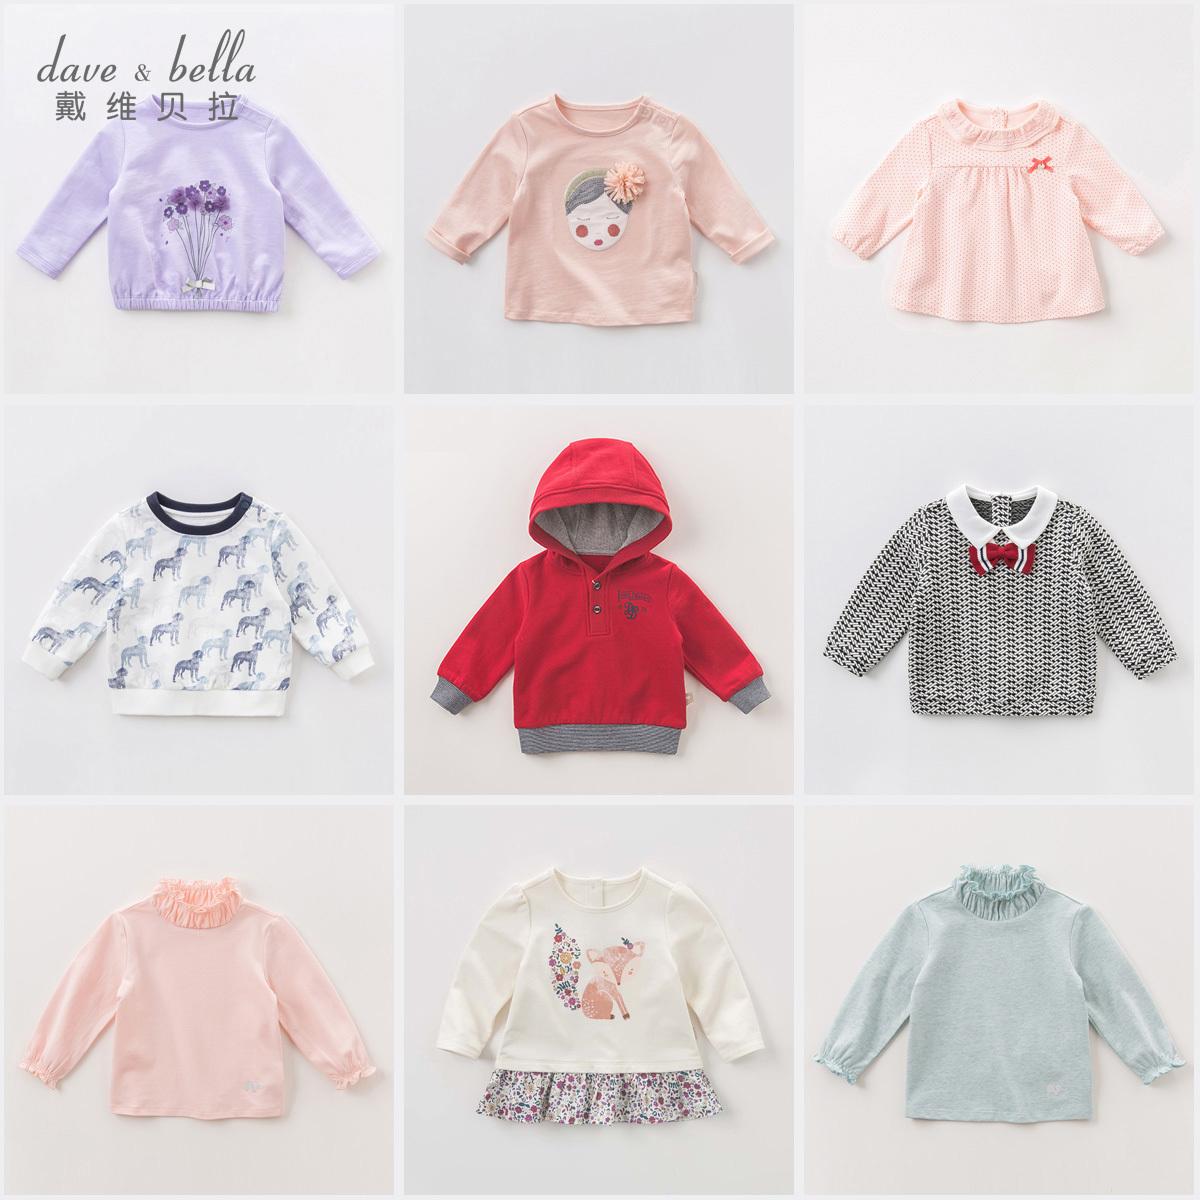 davebella戴维贝拉男女童春秋T恤宝宝夏季短袖POLO衫儿童洋气长袖